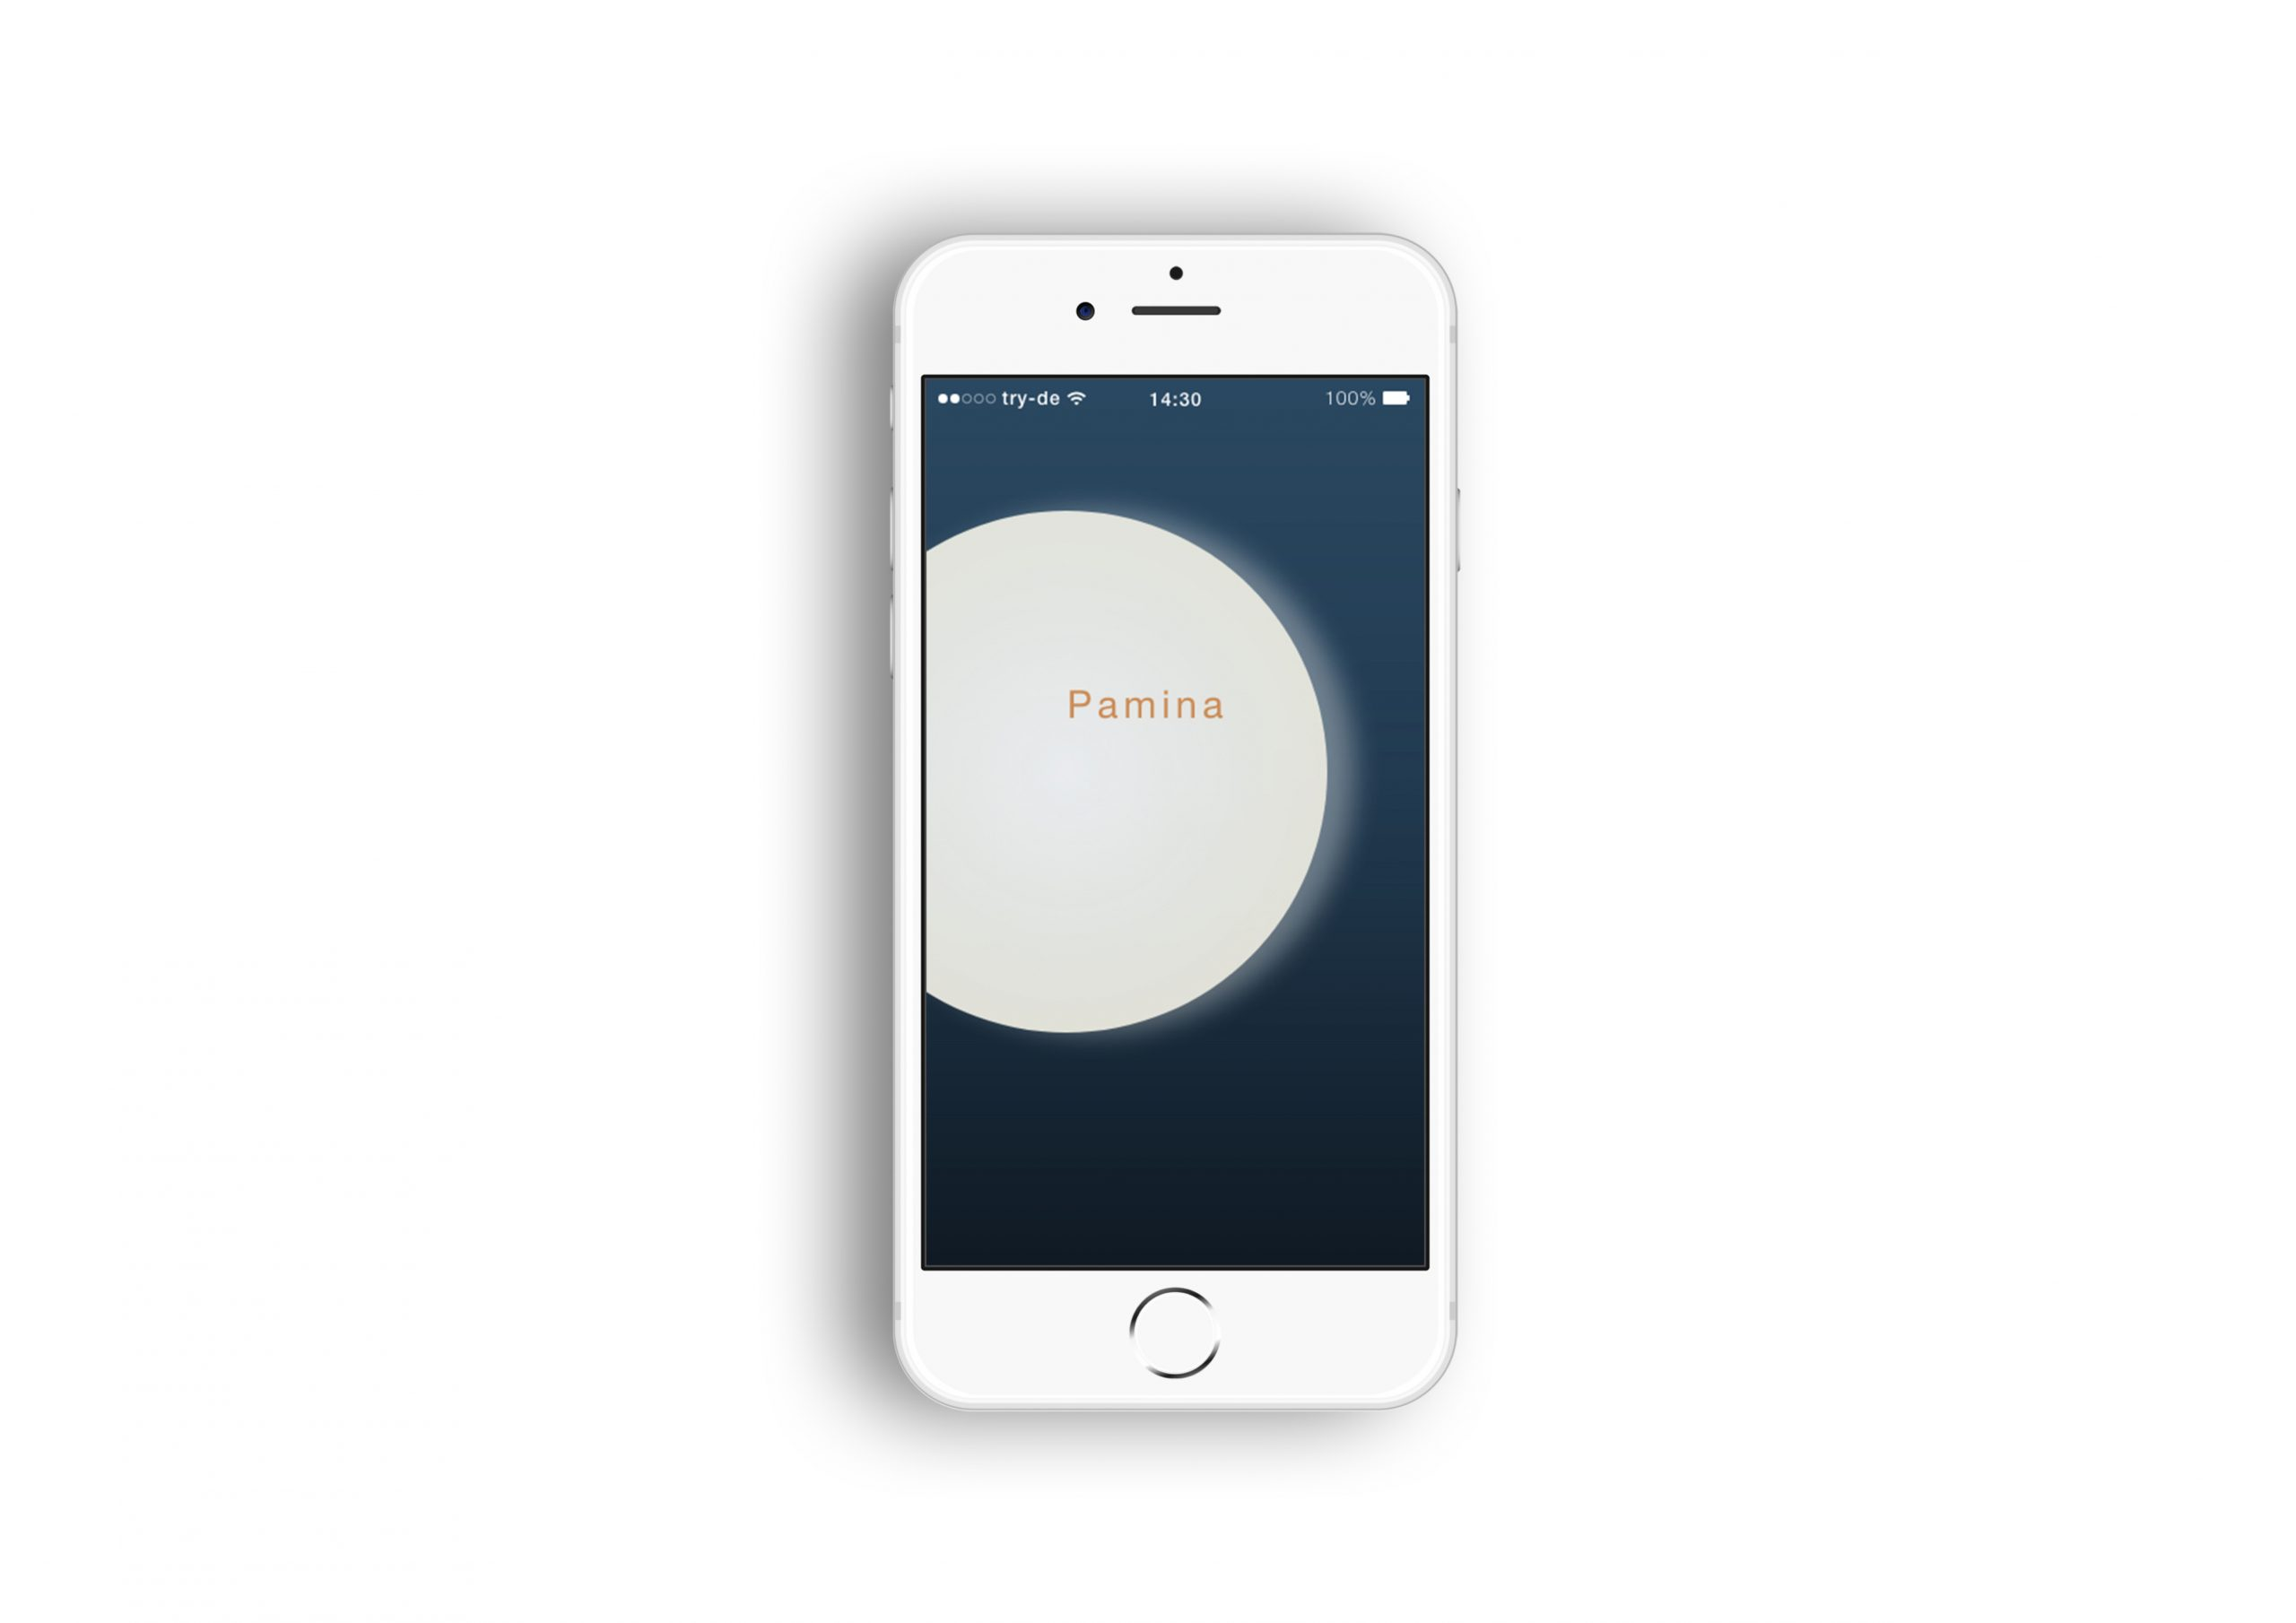 Screendesign der App Pamina